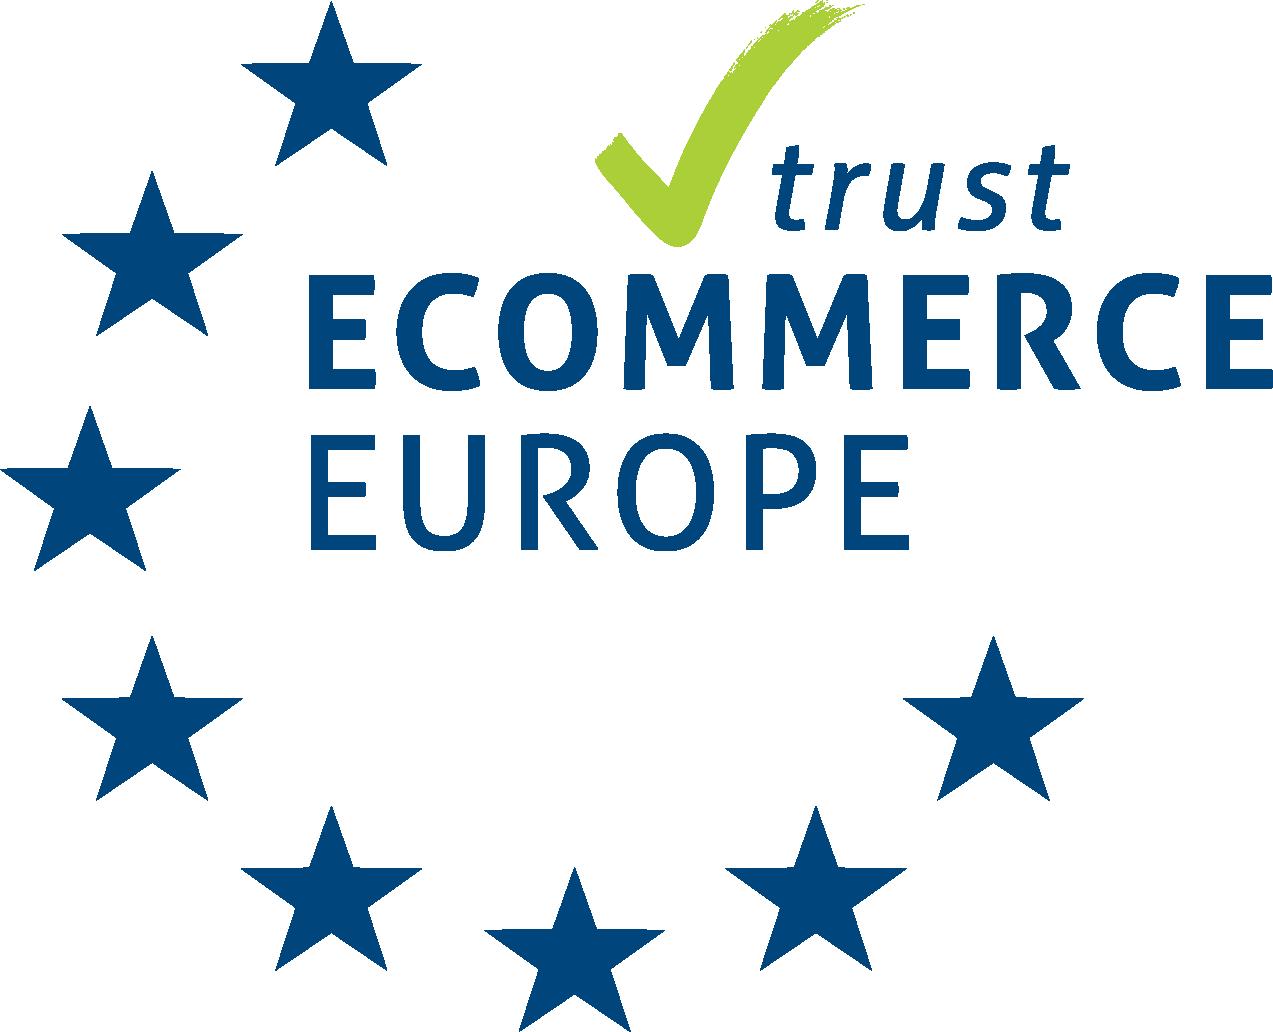 Certifikovaný obchod_trustmark_ecommerce_europe